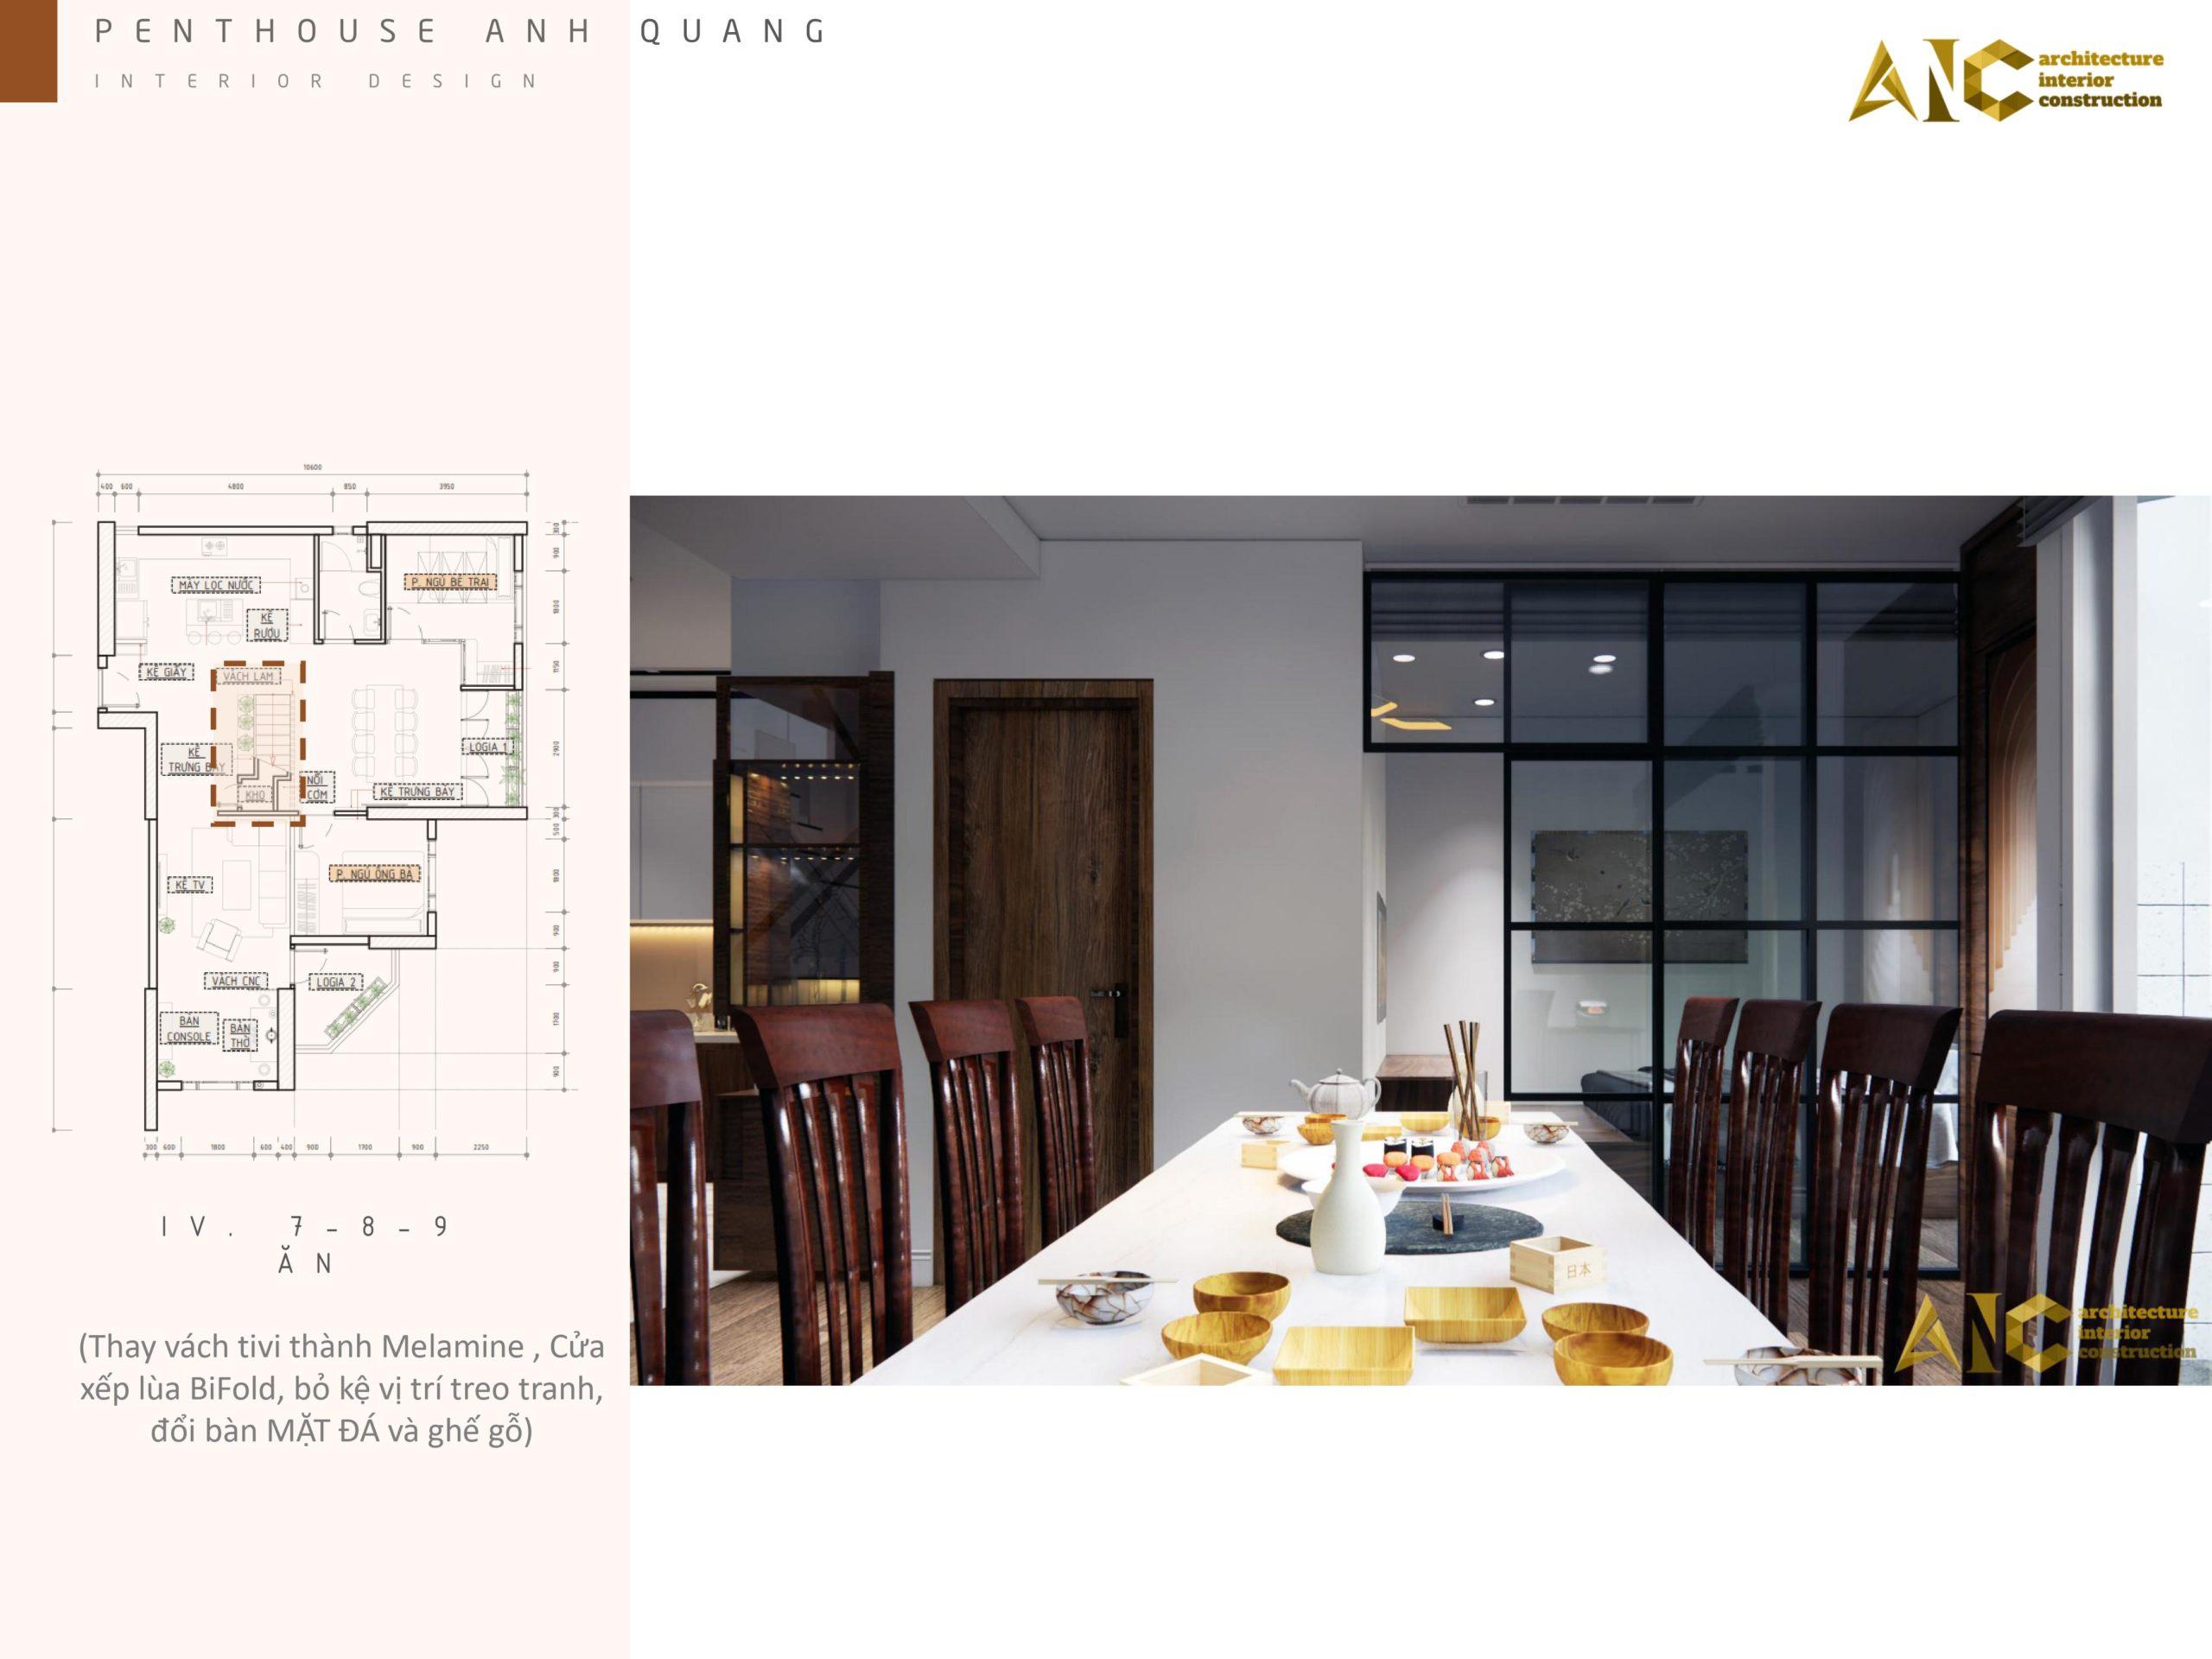 Penthouse-Anh-Quang-AIC-JSC-0016